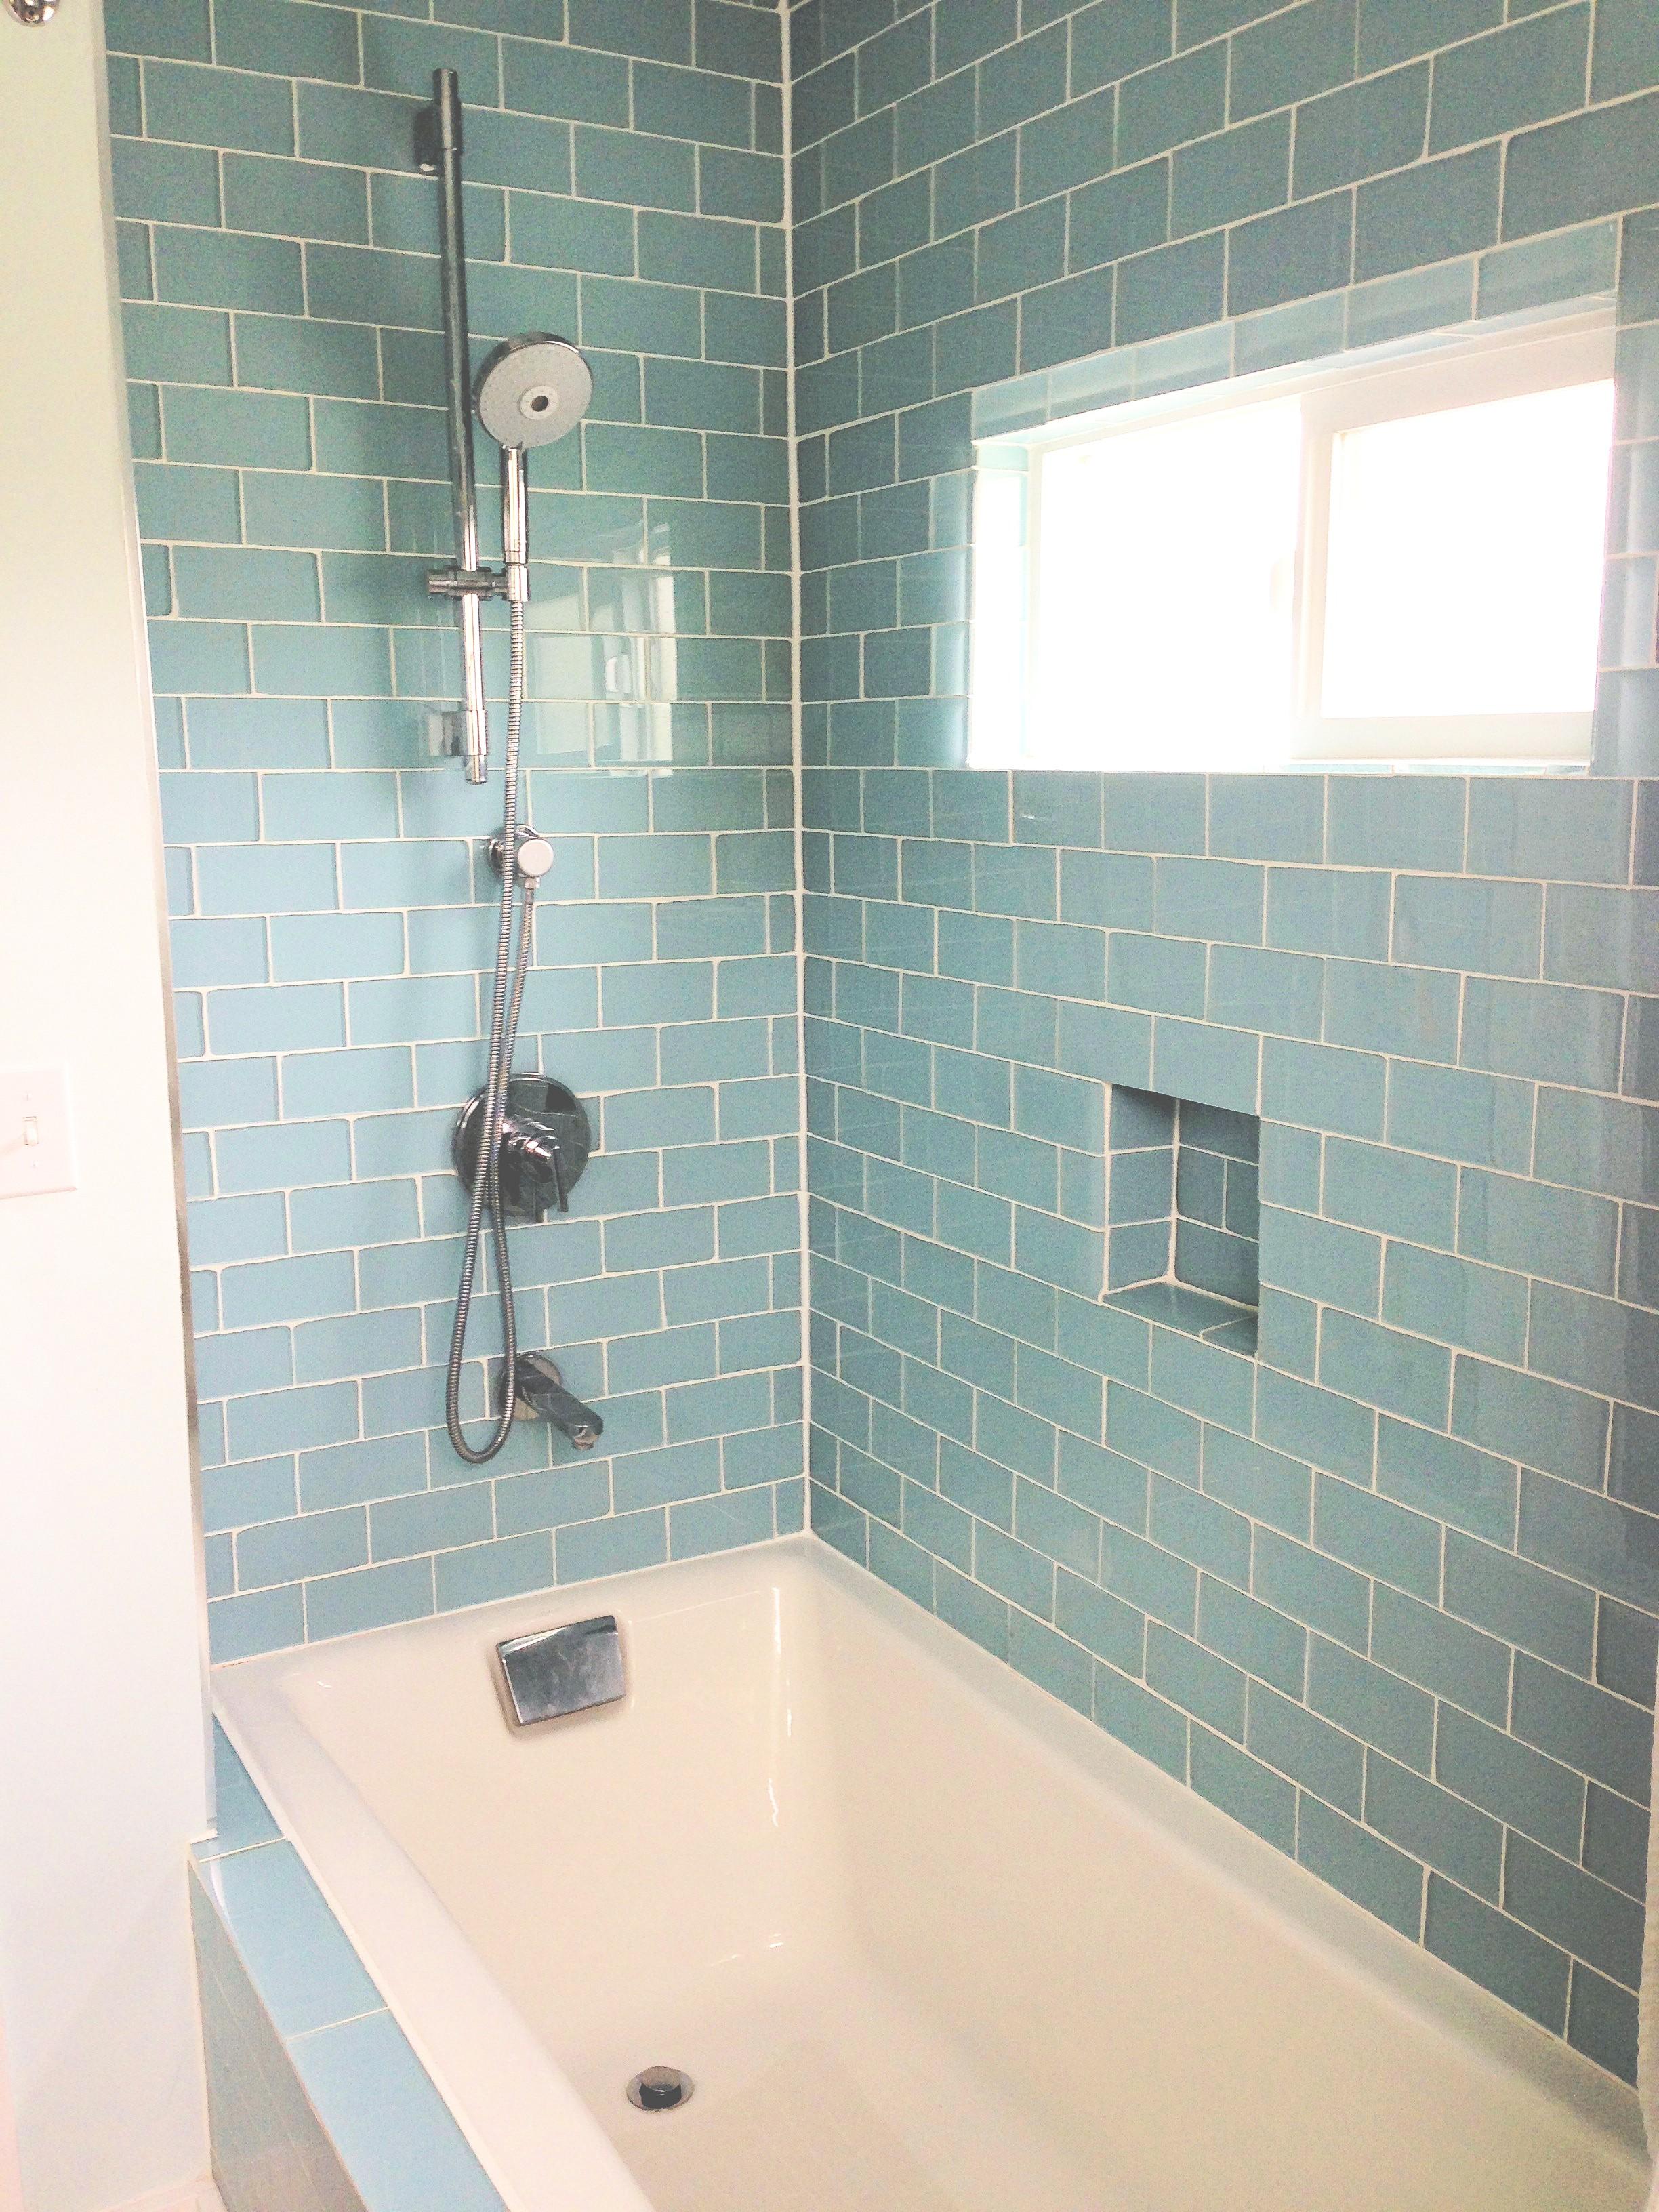 Tiles clipart washroom Vanity Storage Picture Floor Clipart